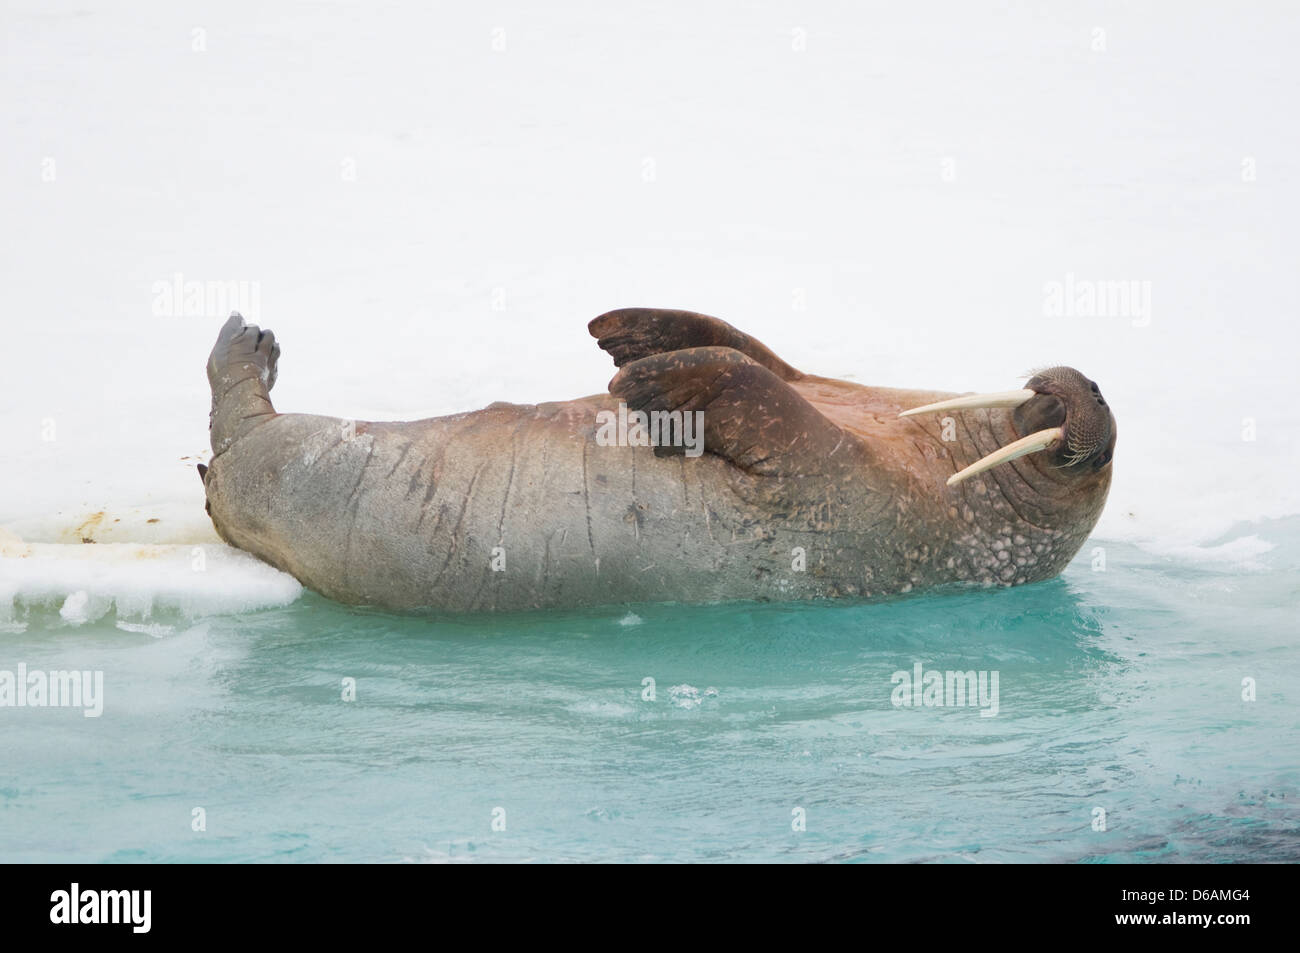 Noruega, el archipiélago de Svalbard, Spitsbergen. La morsa, Odobenus rosmarus, adulto sale de una cubeta de Imagen De Stock